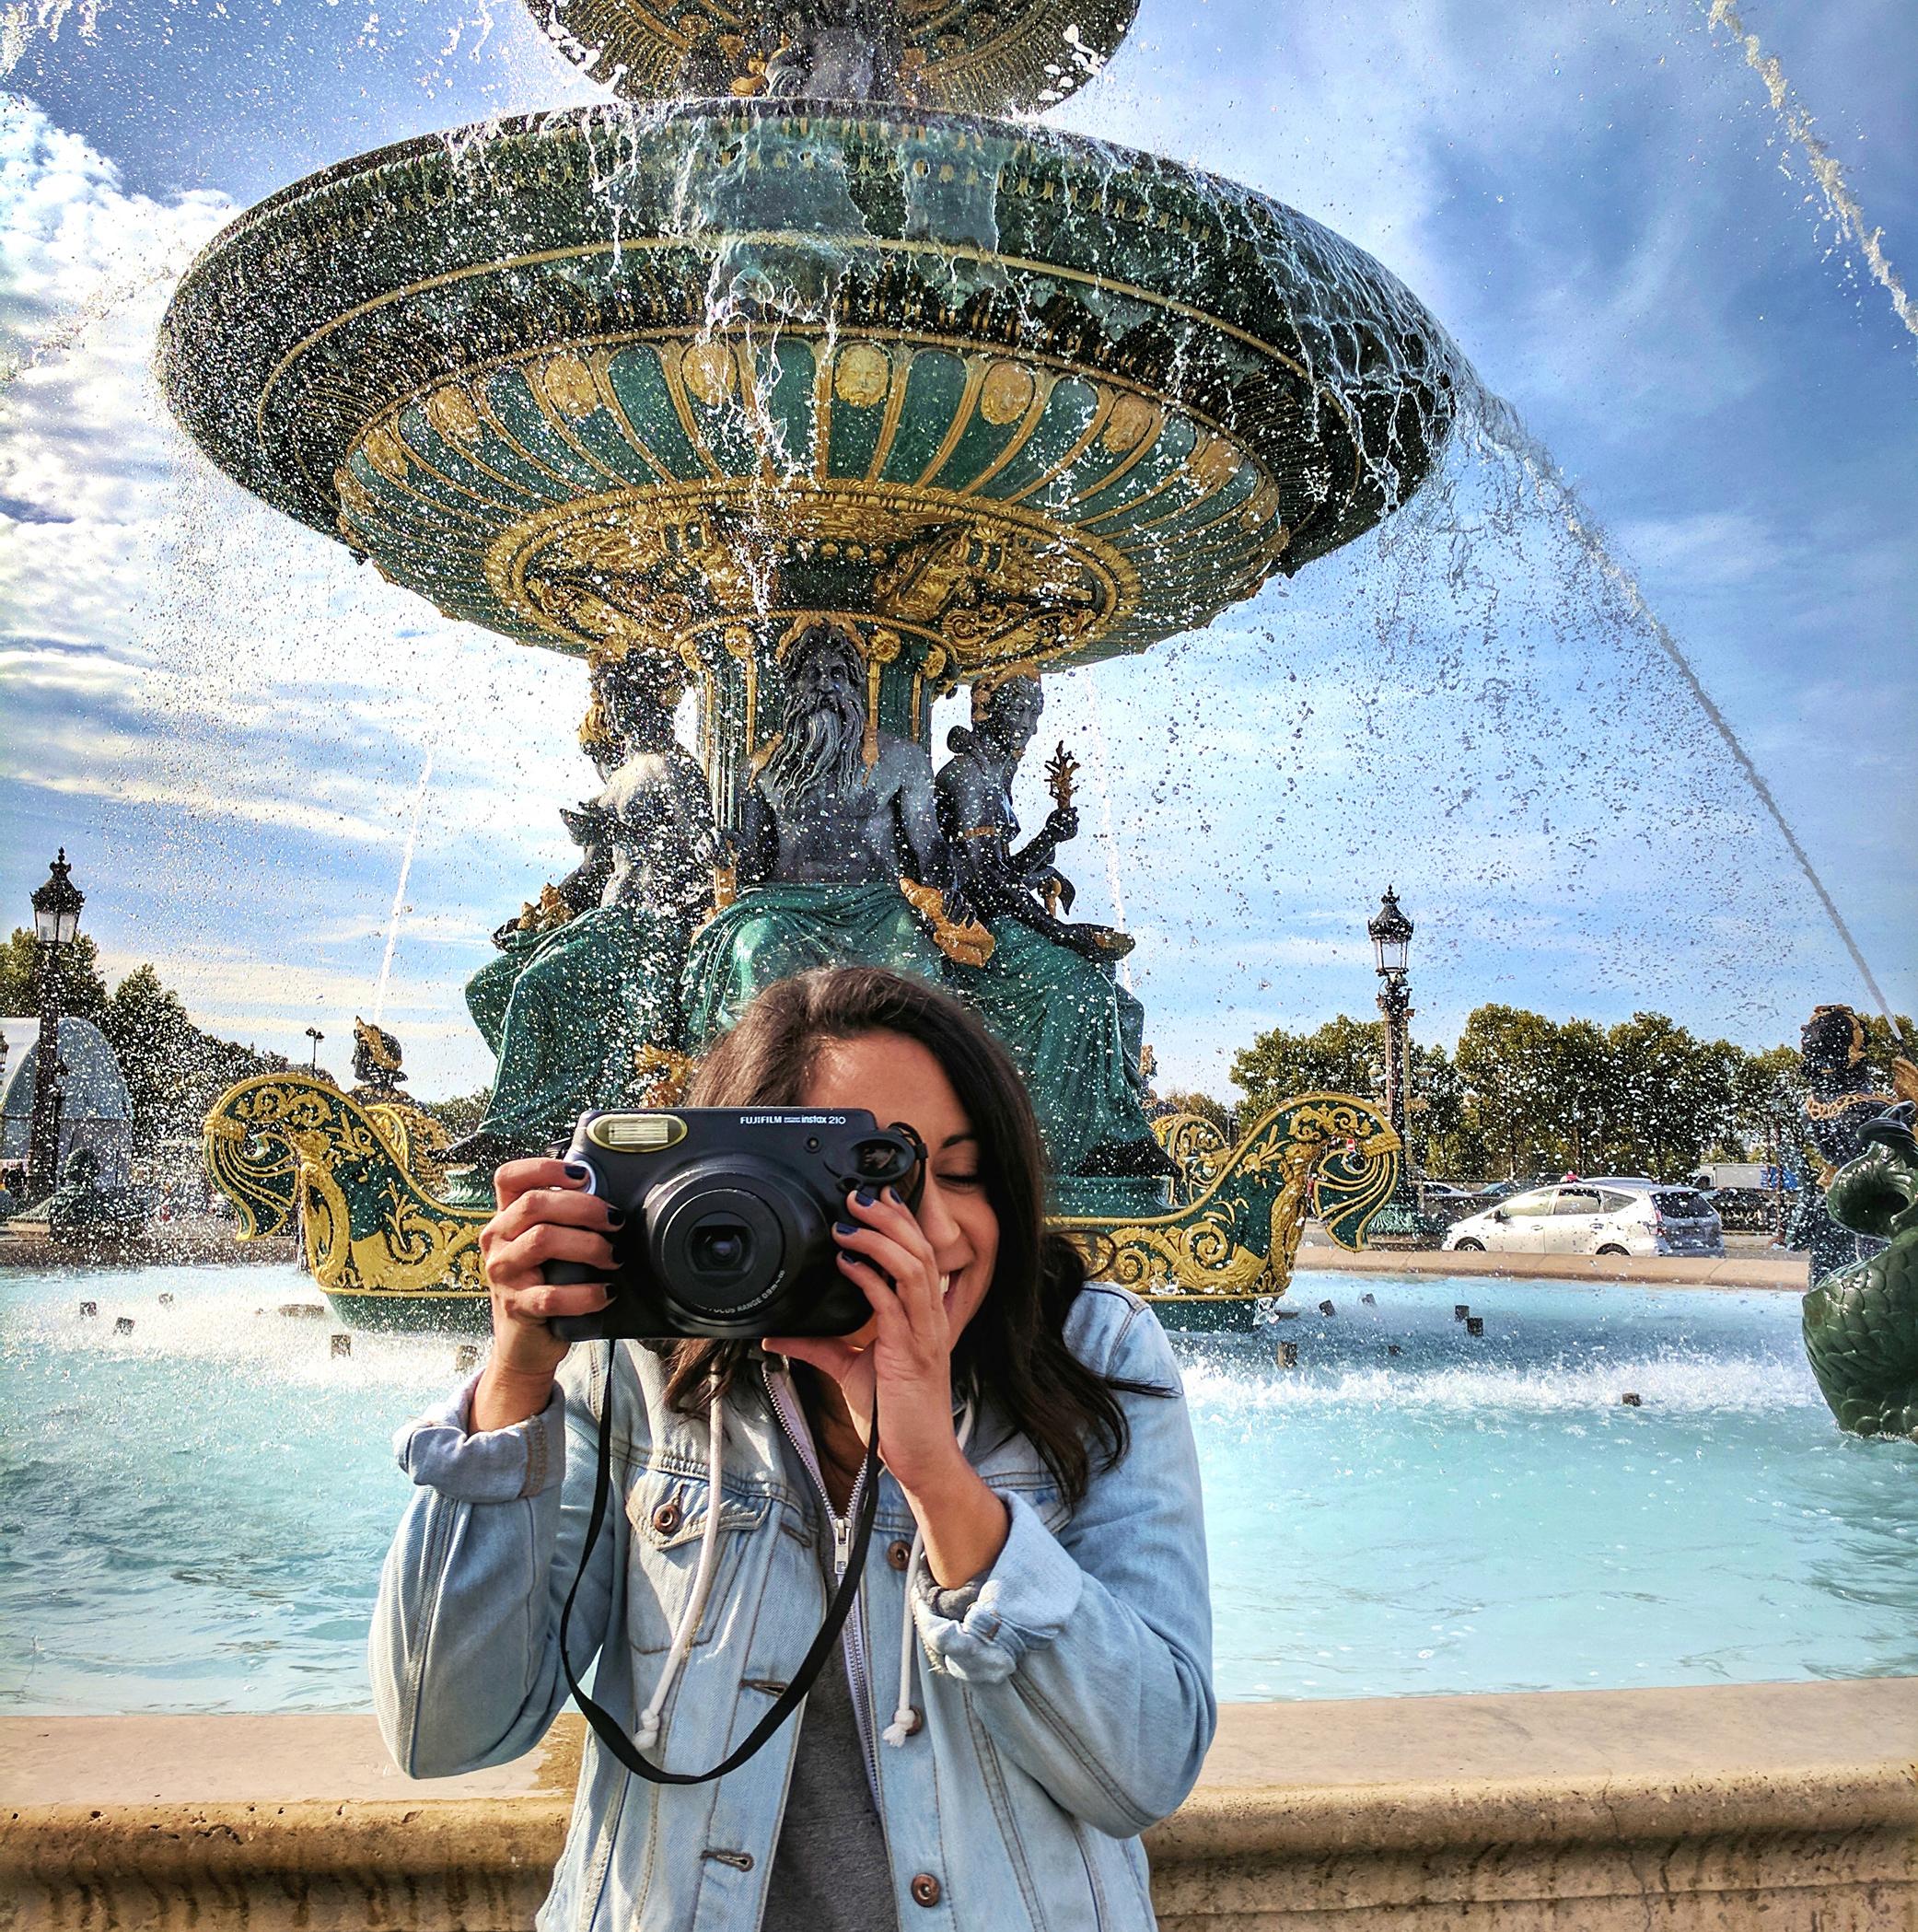 me-polaroid-fountain.jpg